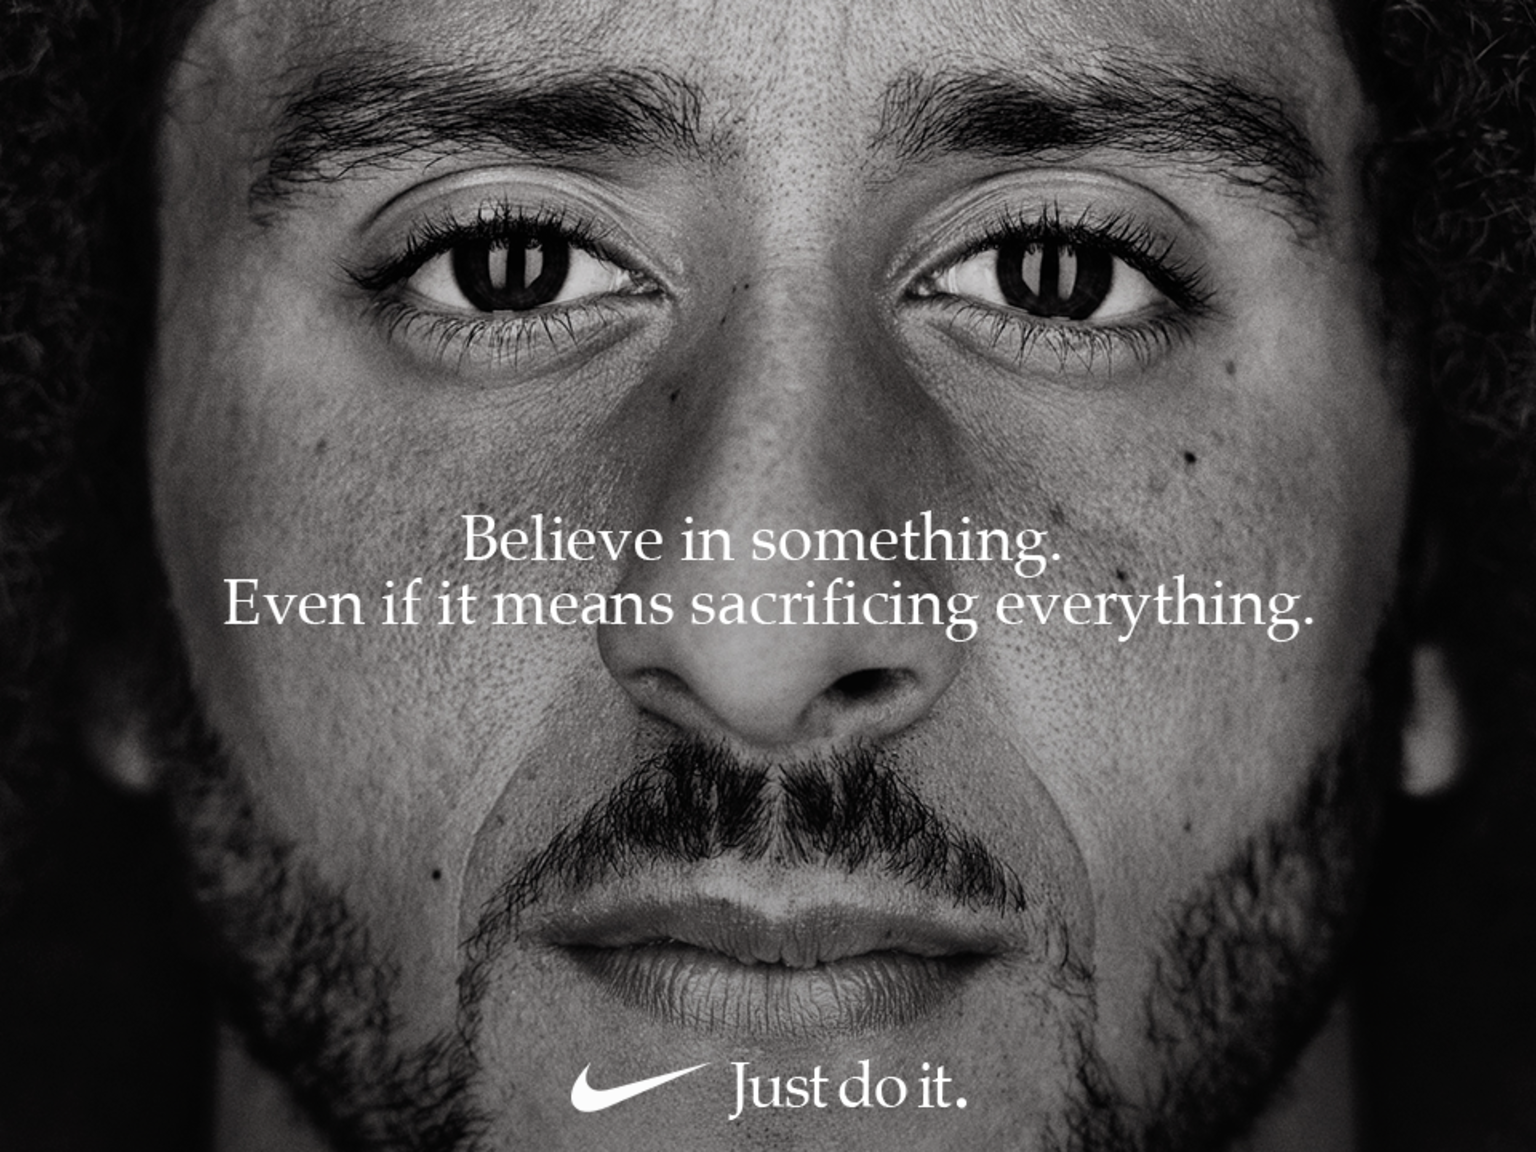 Colin Kaepernick @Kaepernick7@Nike #JustDoit Campaign & National Anthem Kneeling Row #TakeTheKnee @realDonaldTrump